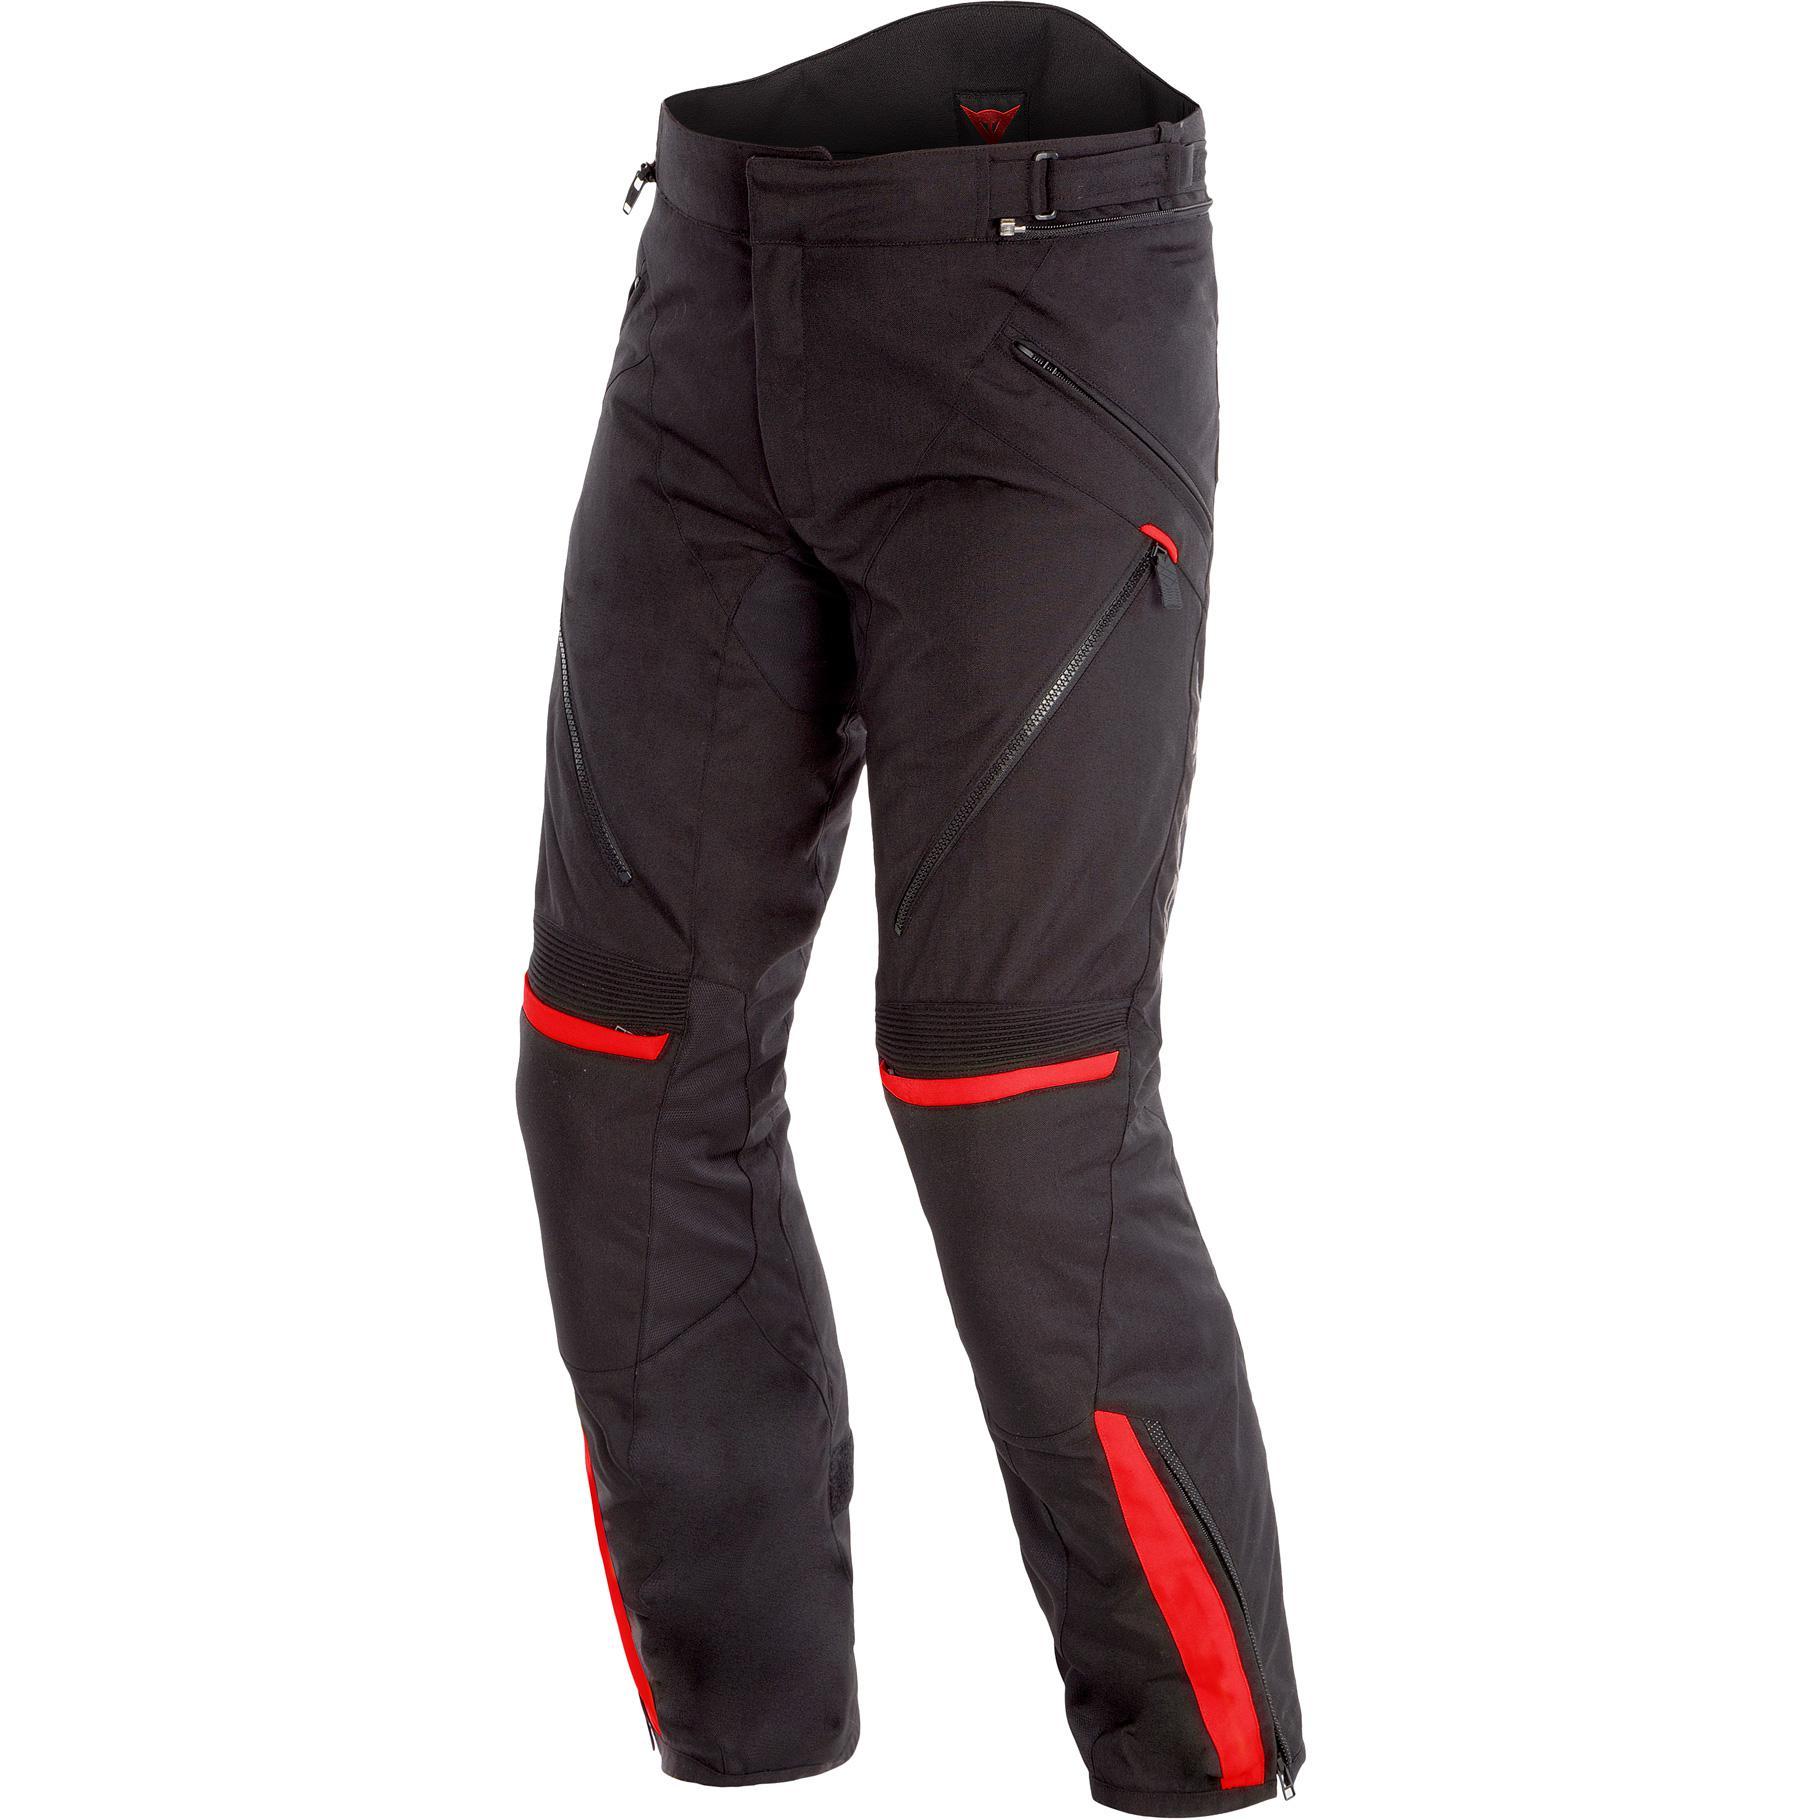 DAINESE-Pantalon TEMPEST 2 D-DRY